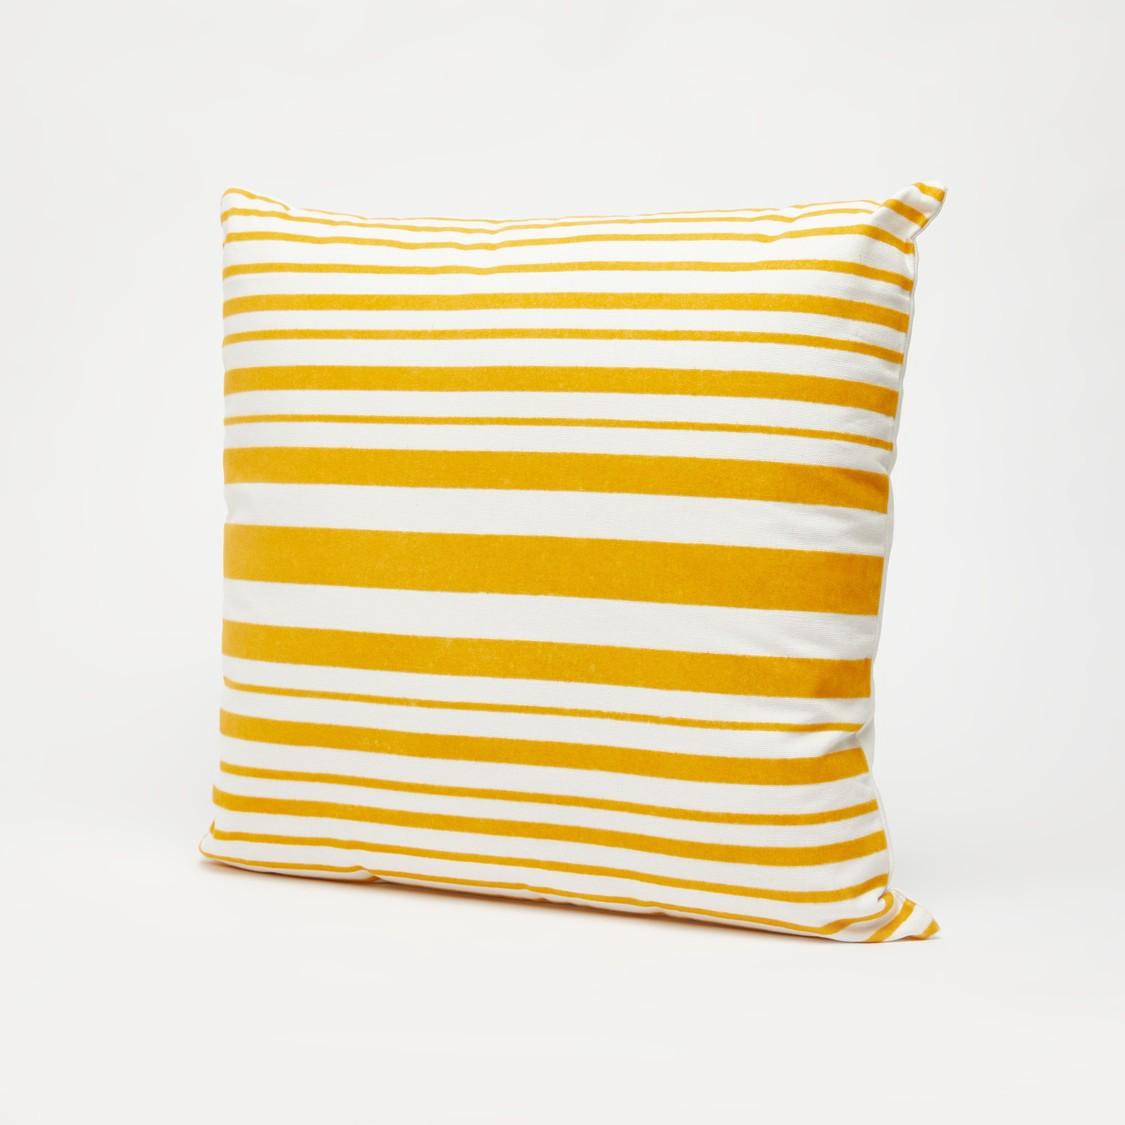 Striped Filled Cushion with Zipper Closure - 45x45 cms